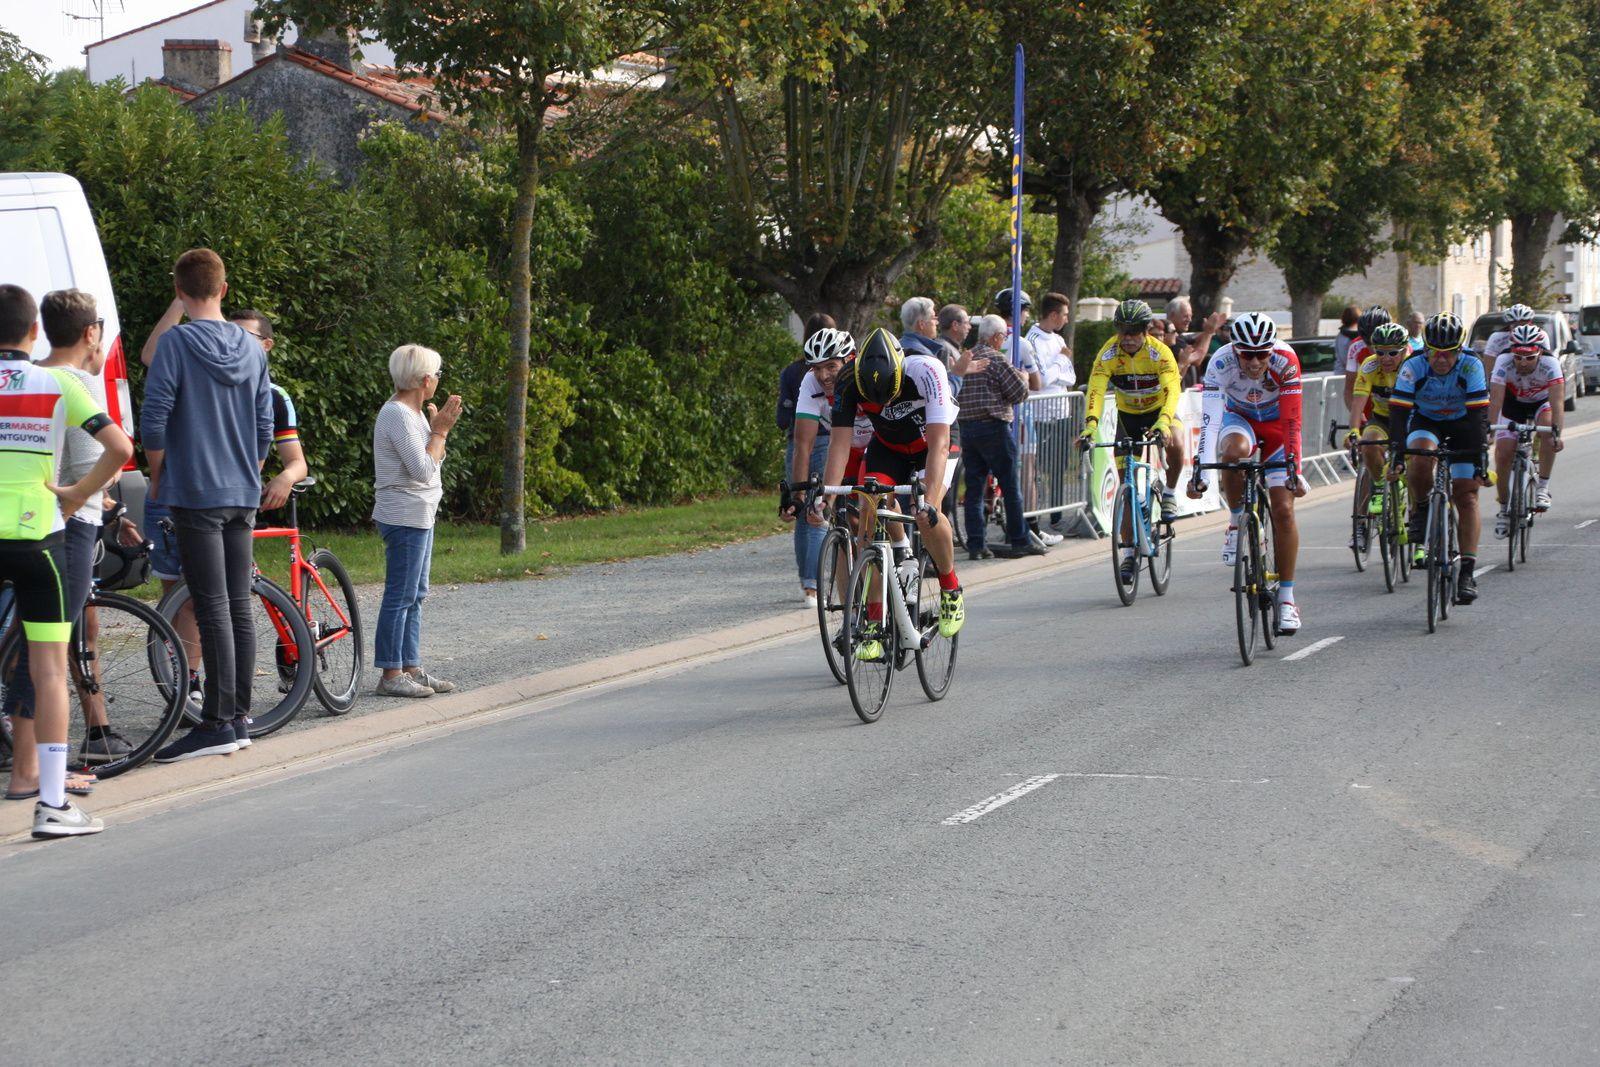 6e  , 7e  Hervé  BREQUE(AC Nieul les Saintes), 8e  , 9e  Philippe  LECHEVALIER(VC  Saintes), 10e  Jean-Claude  VERREKEN(VC  Le Gua).